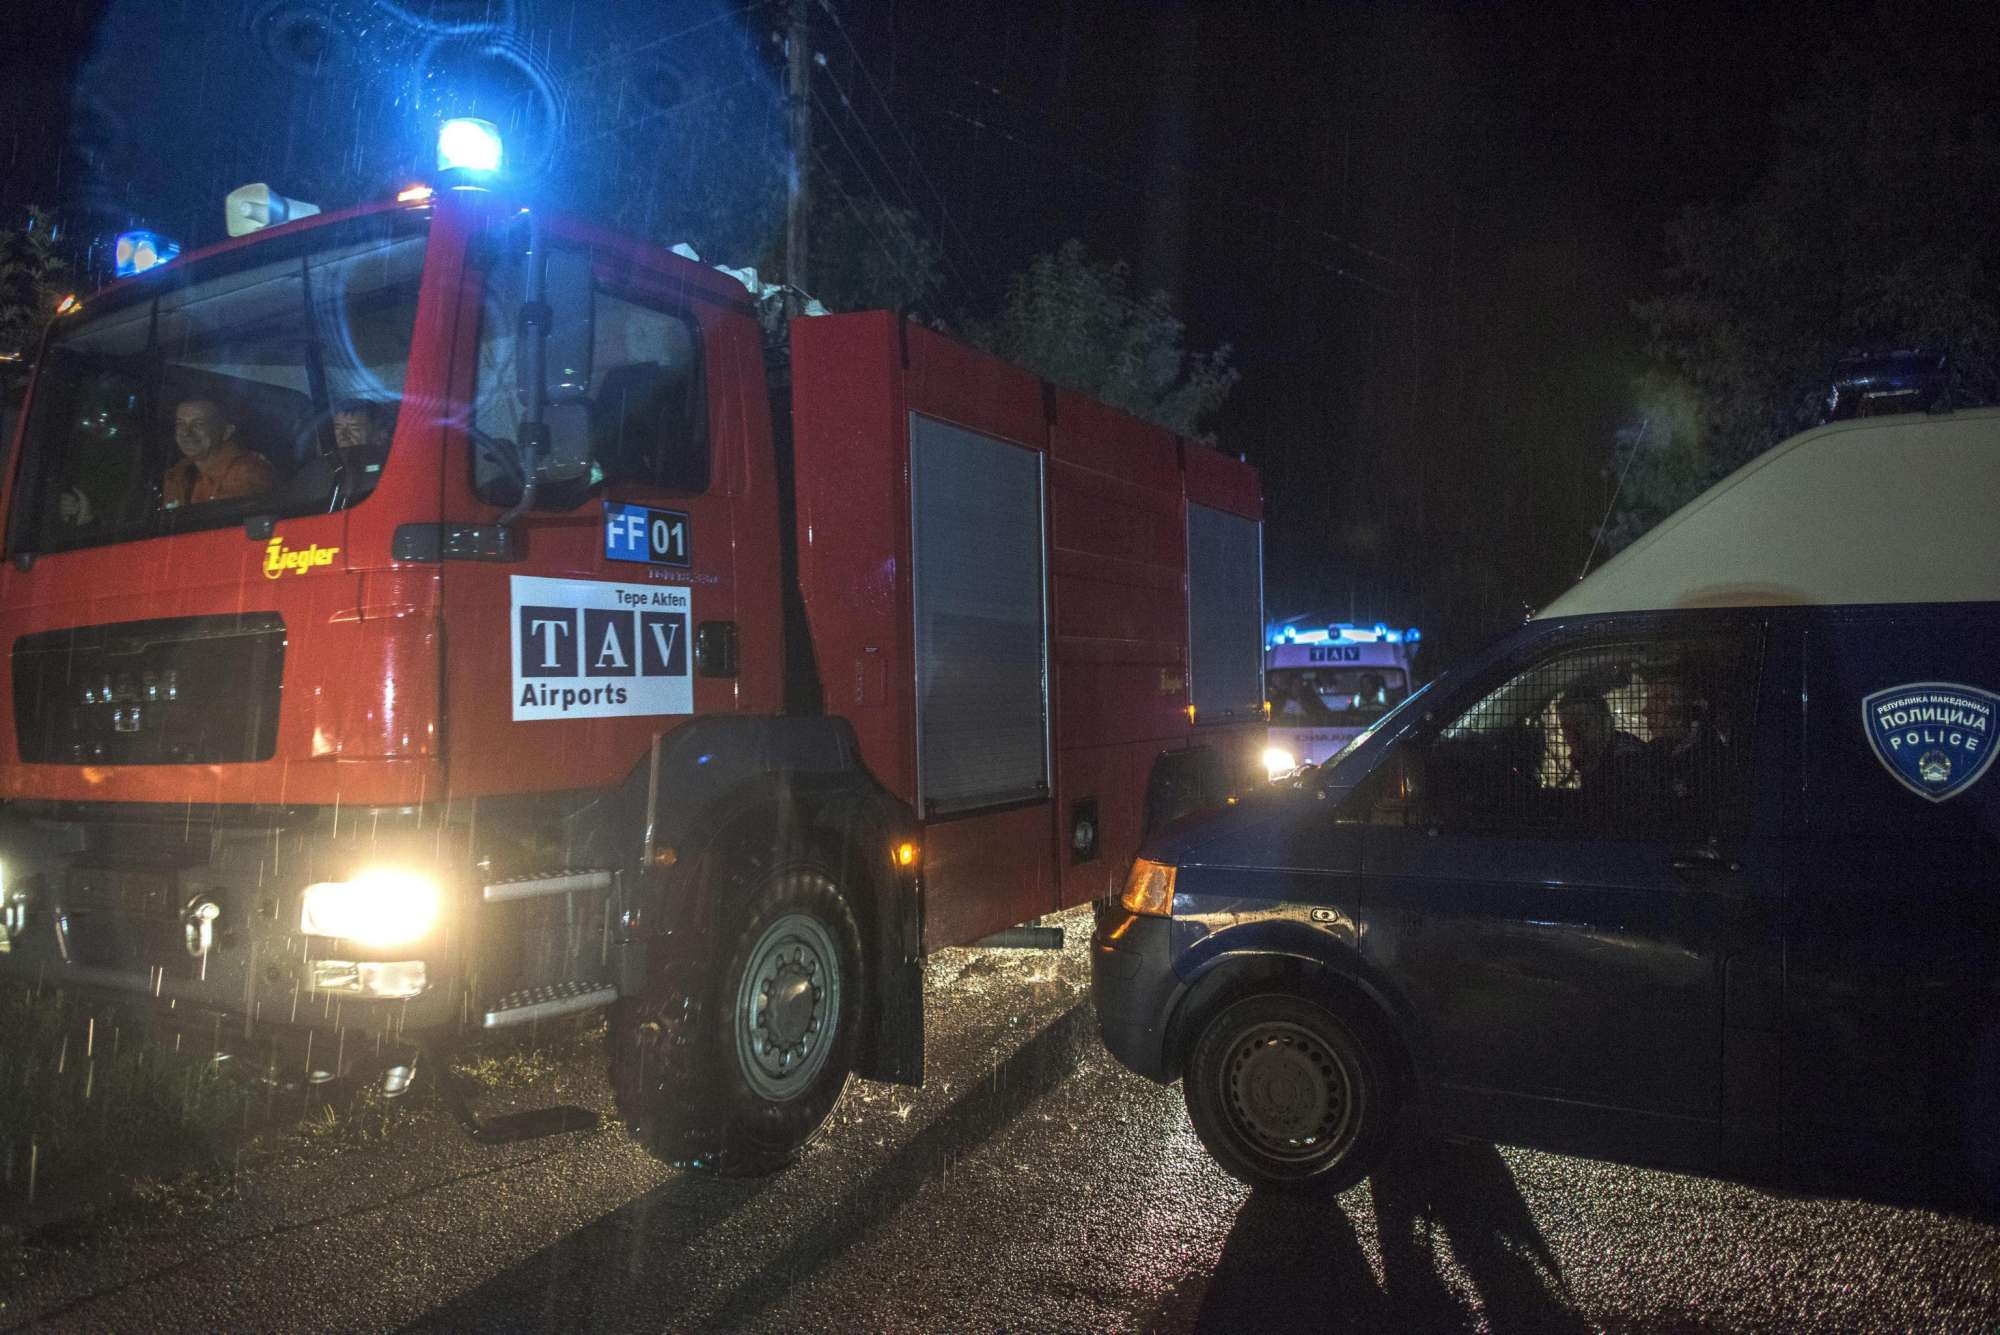 Sciagura aerea in Macedonia, tutte italiane le sei vittime